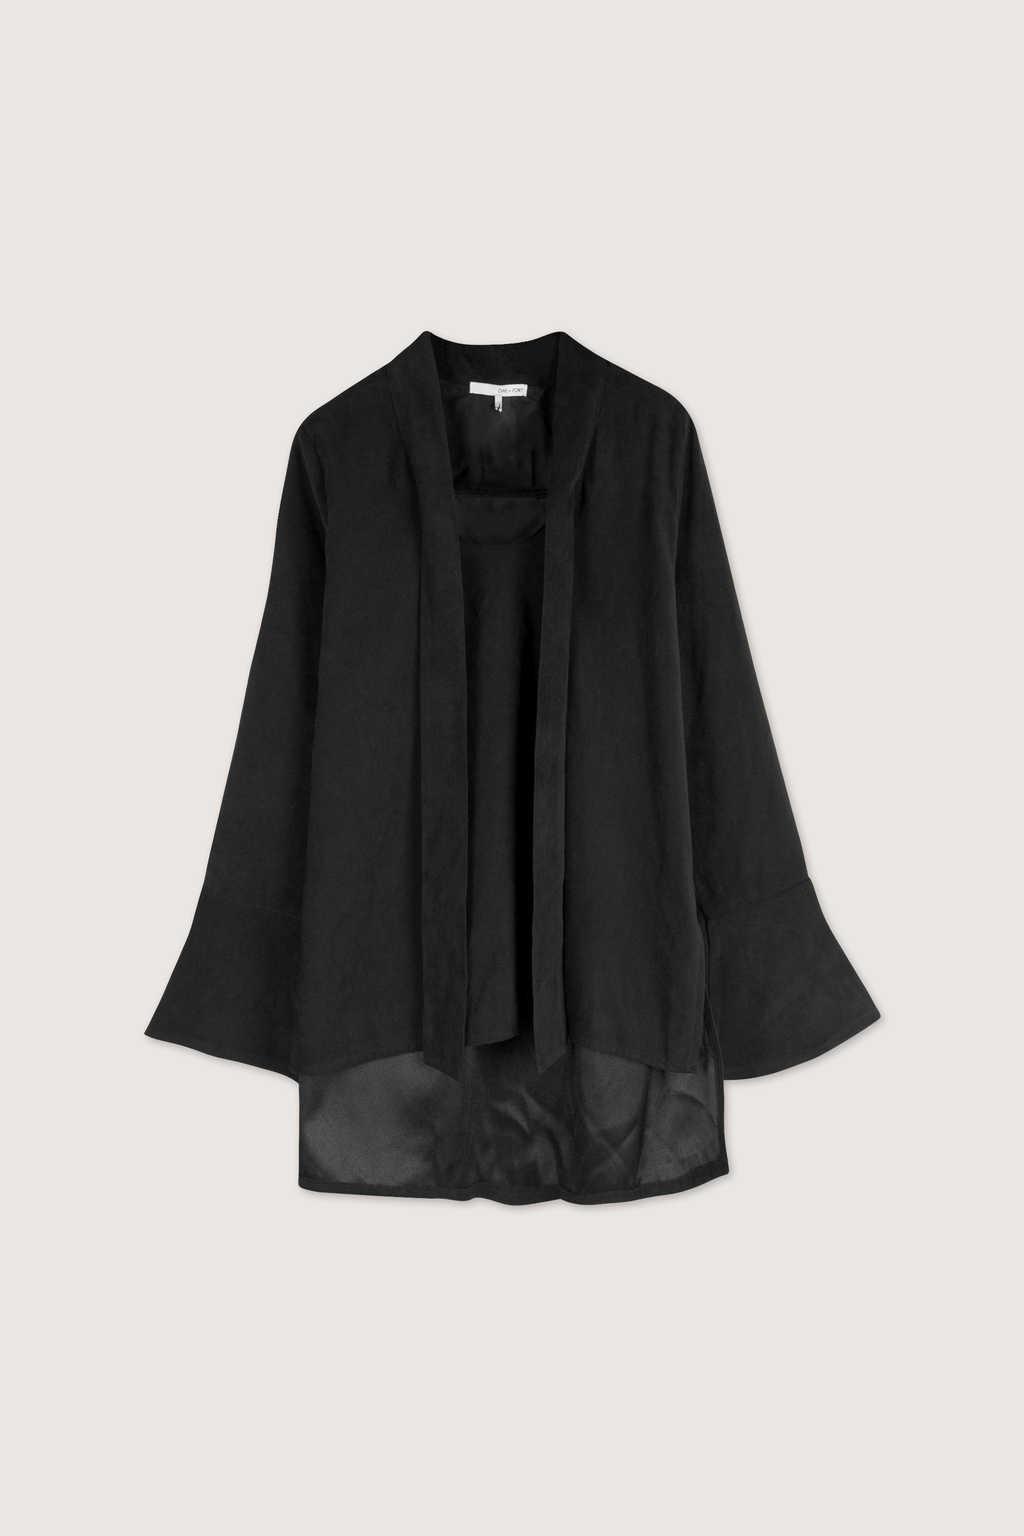 Blouse H355 Black 10